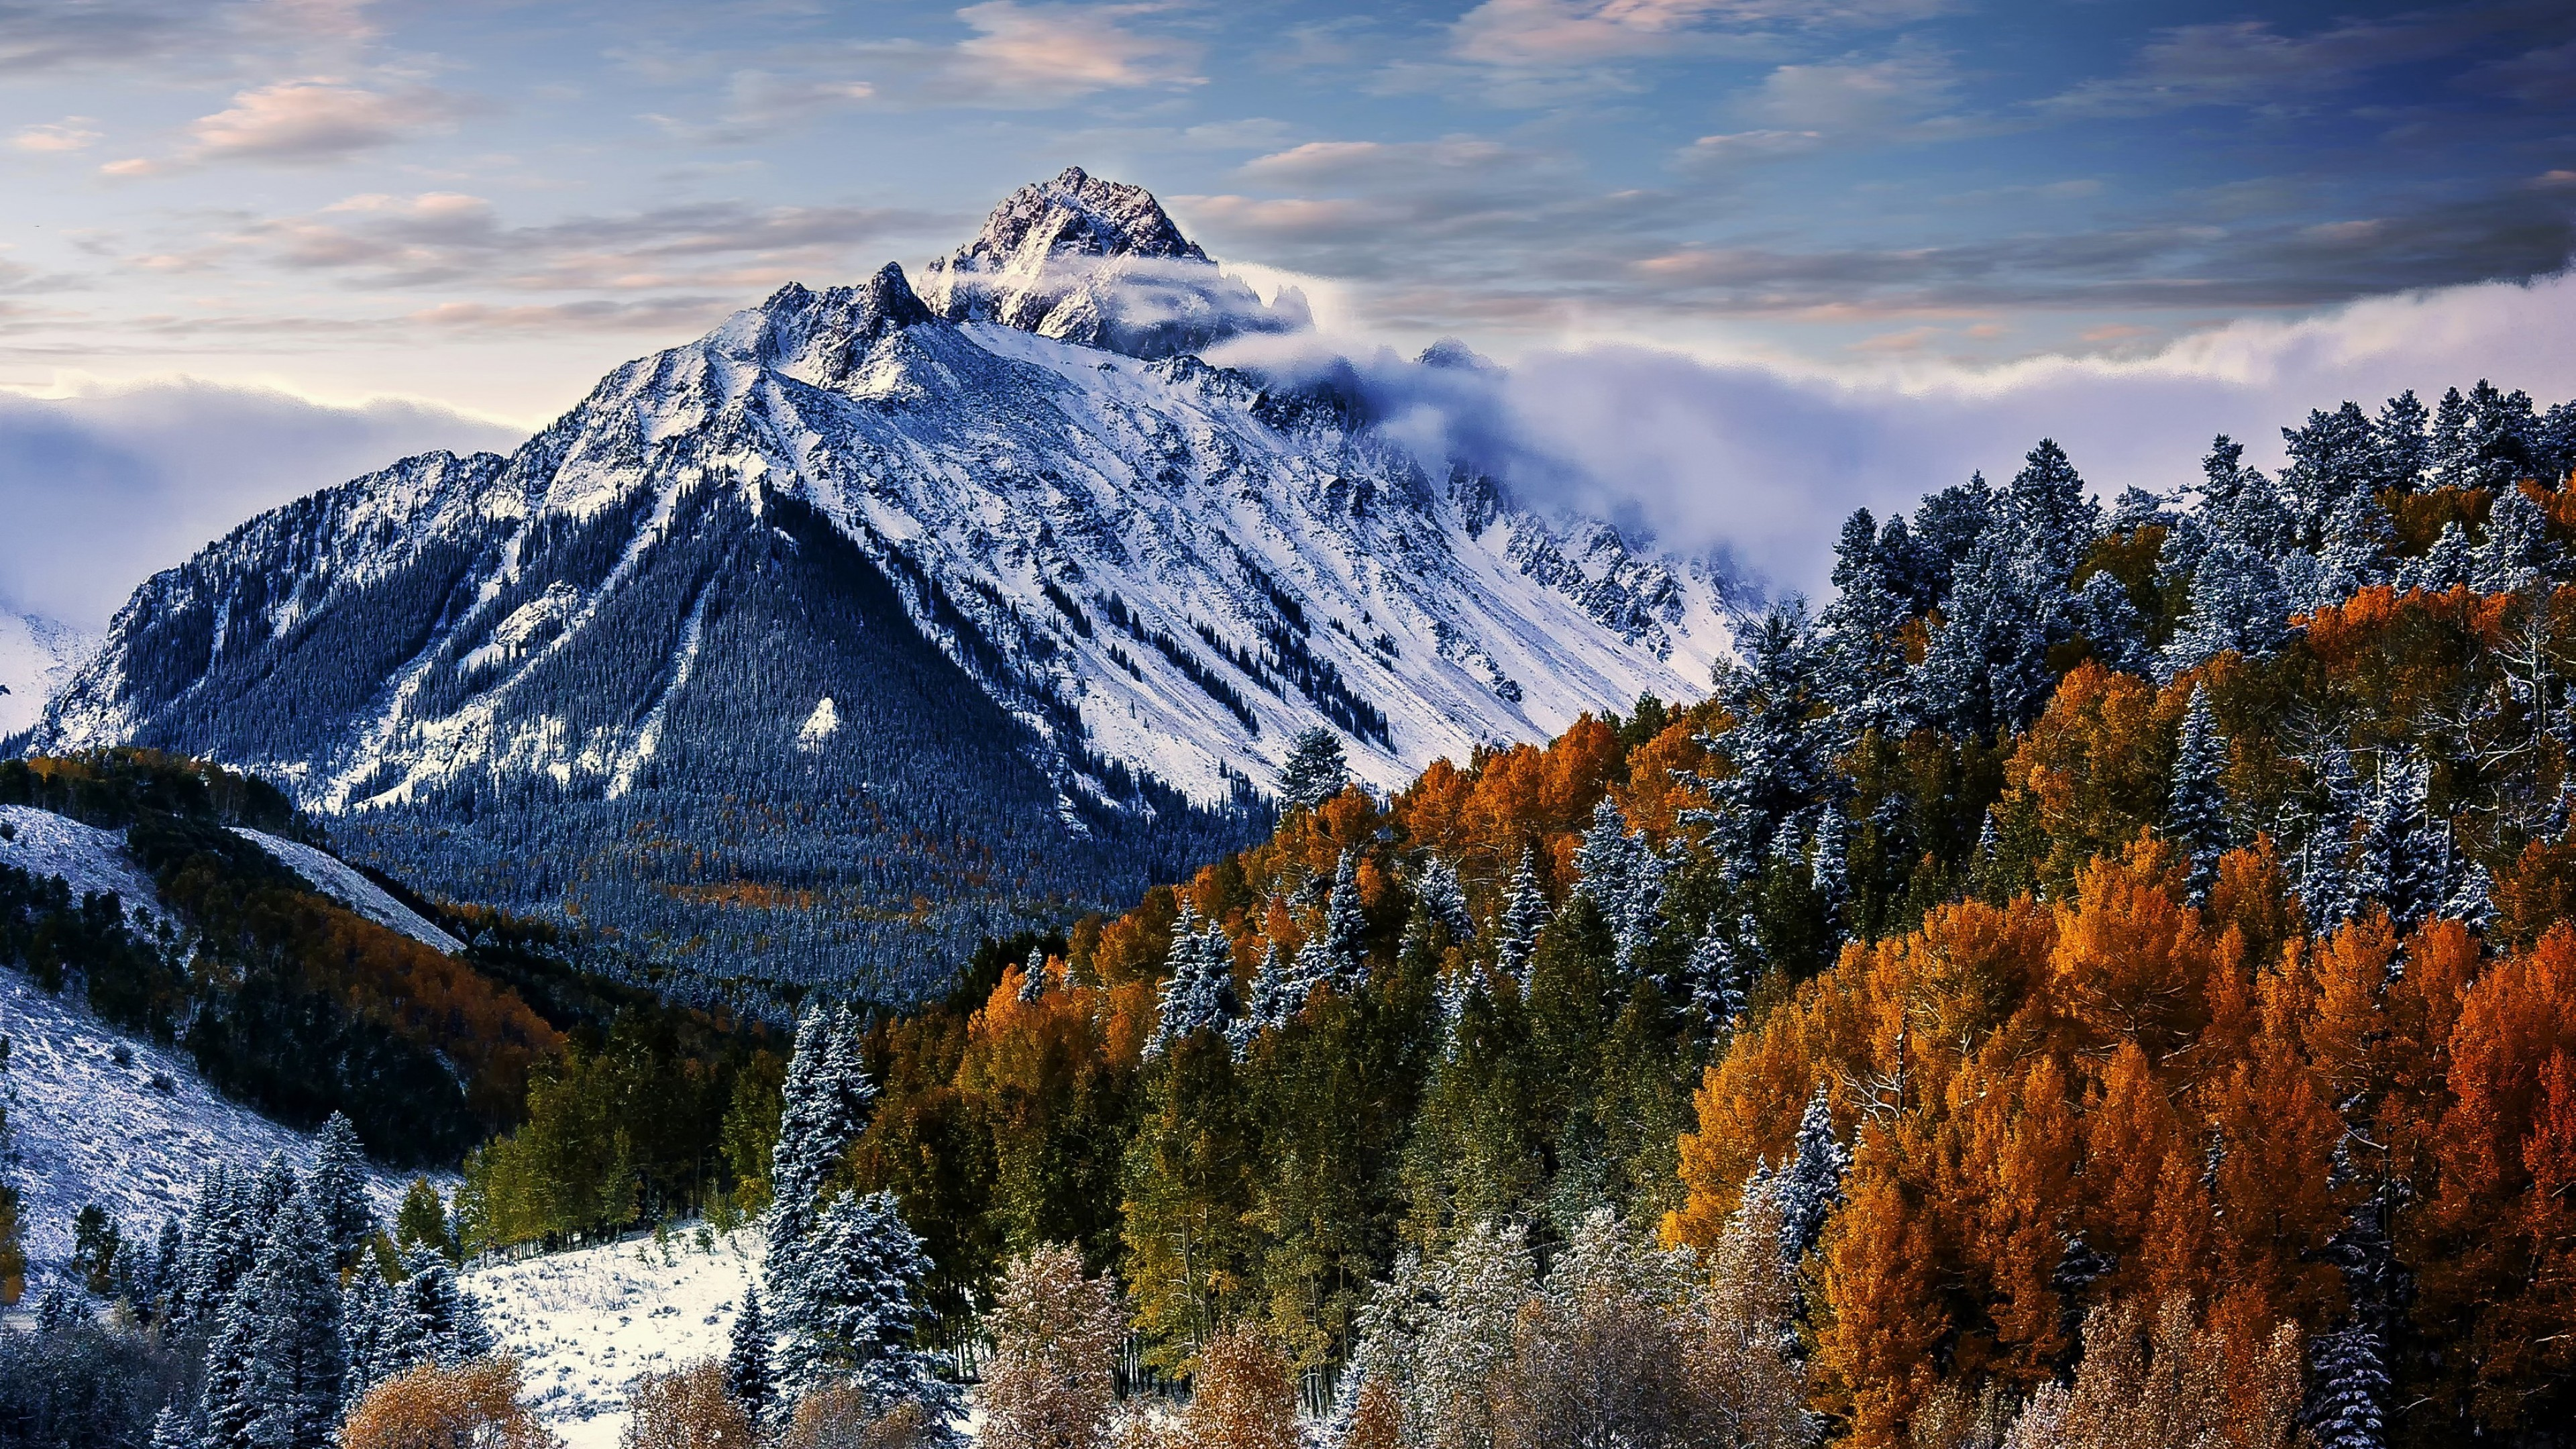 Wallpaper Mountains in Sneffels forest